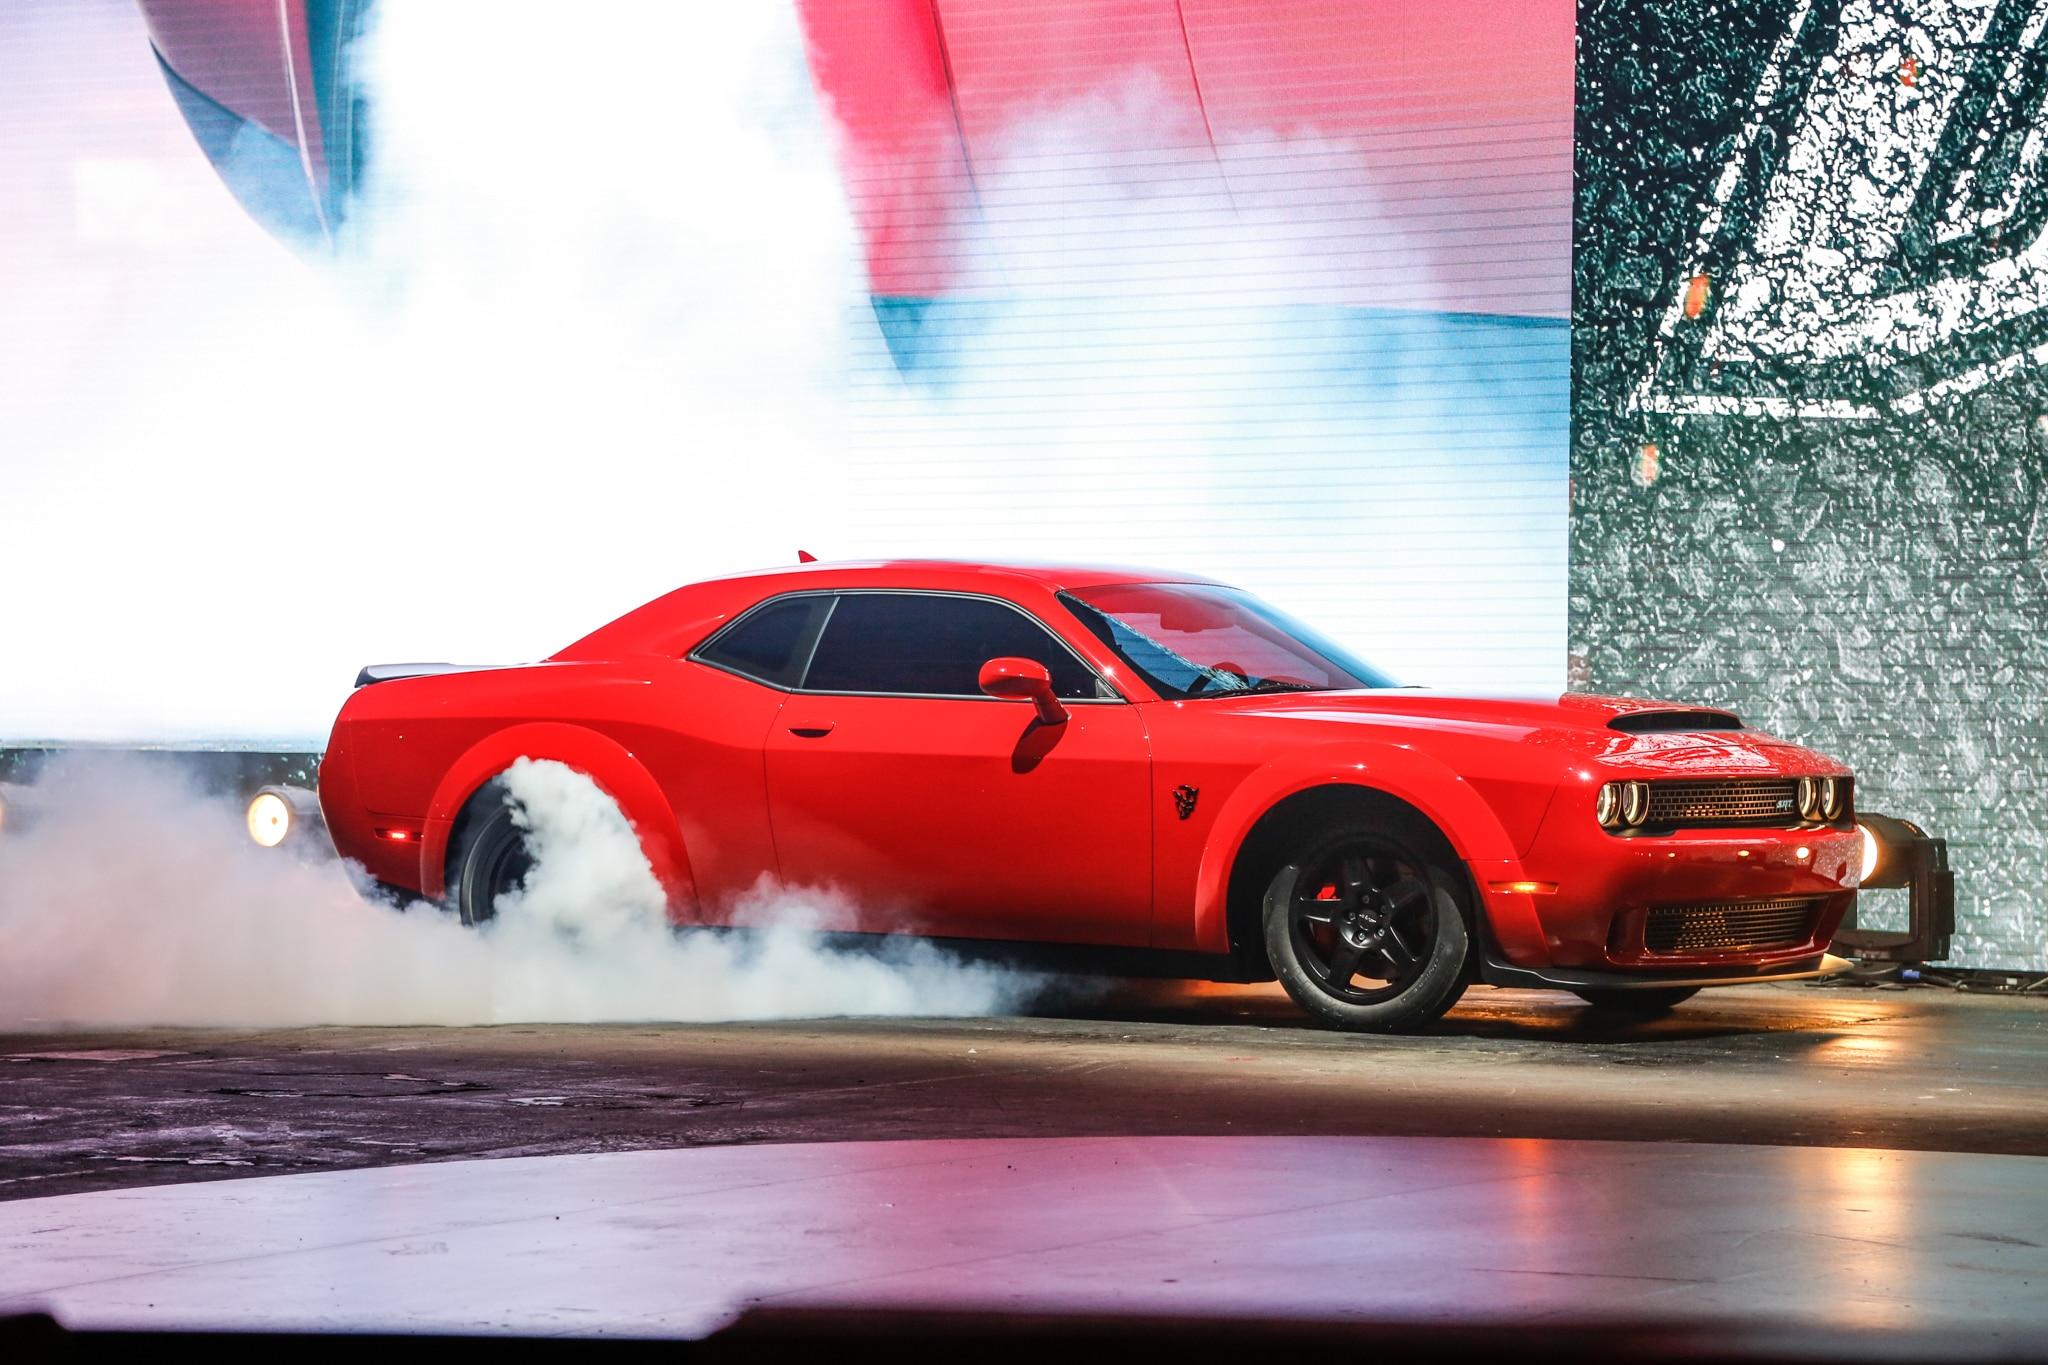 2018 Dodge Challenger SRT Demon burnout